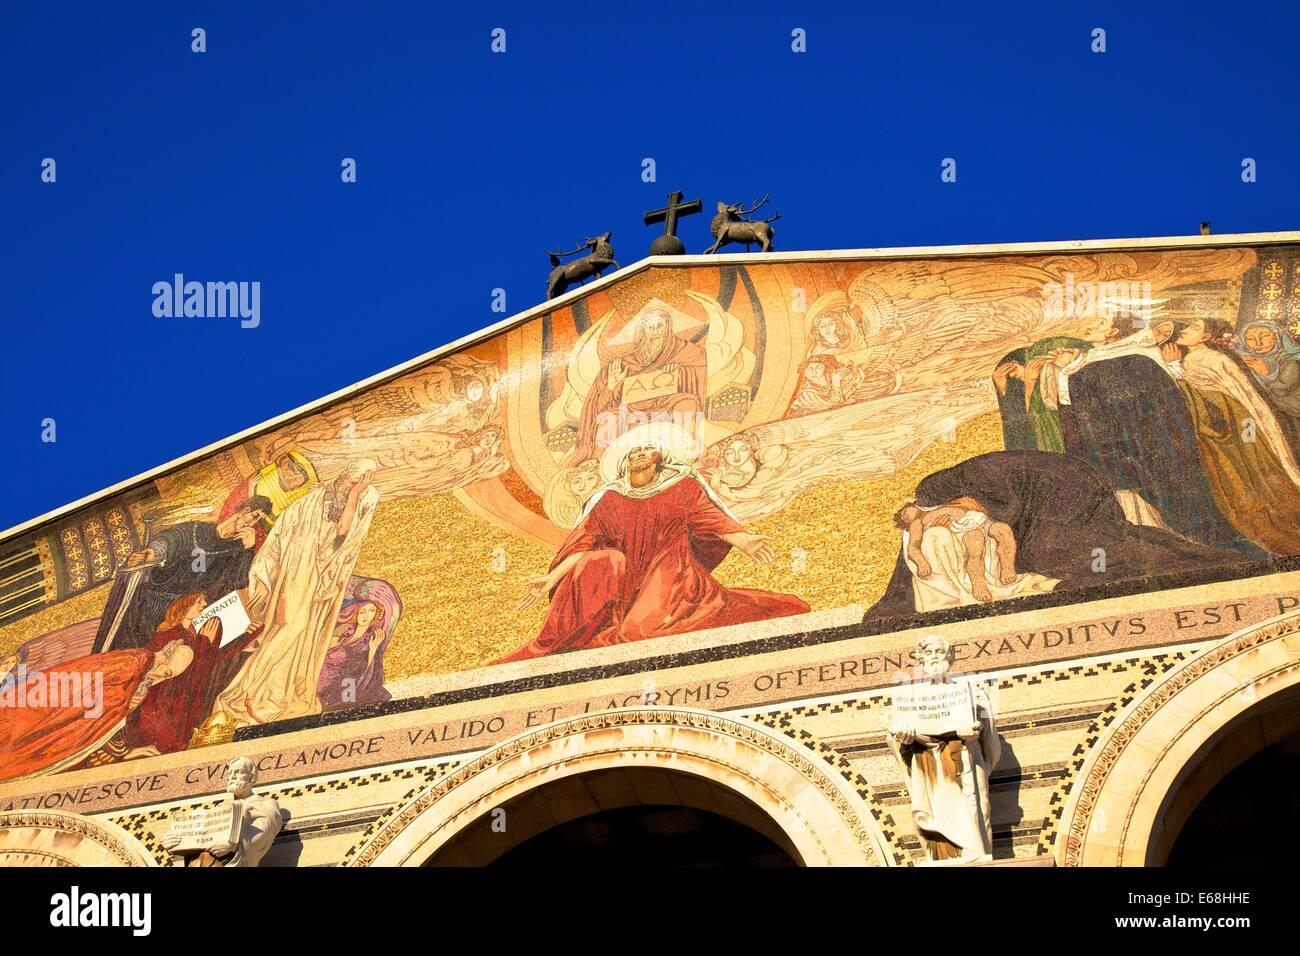 Basilica Of The Agony And Church Of St. Mary Magdelene, Garden Of Gethsemane, Jerusalem, Israel, Middle East - Stock Image